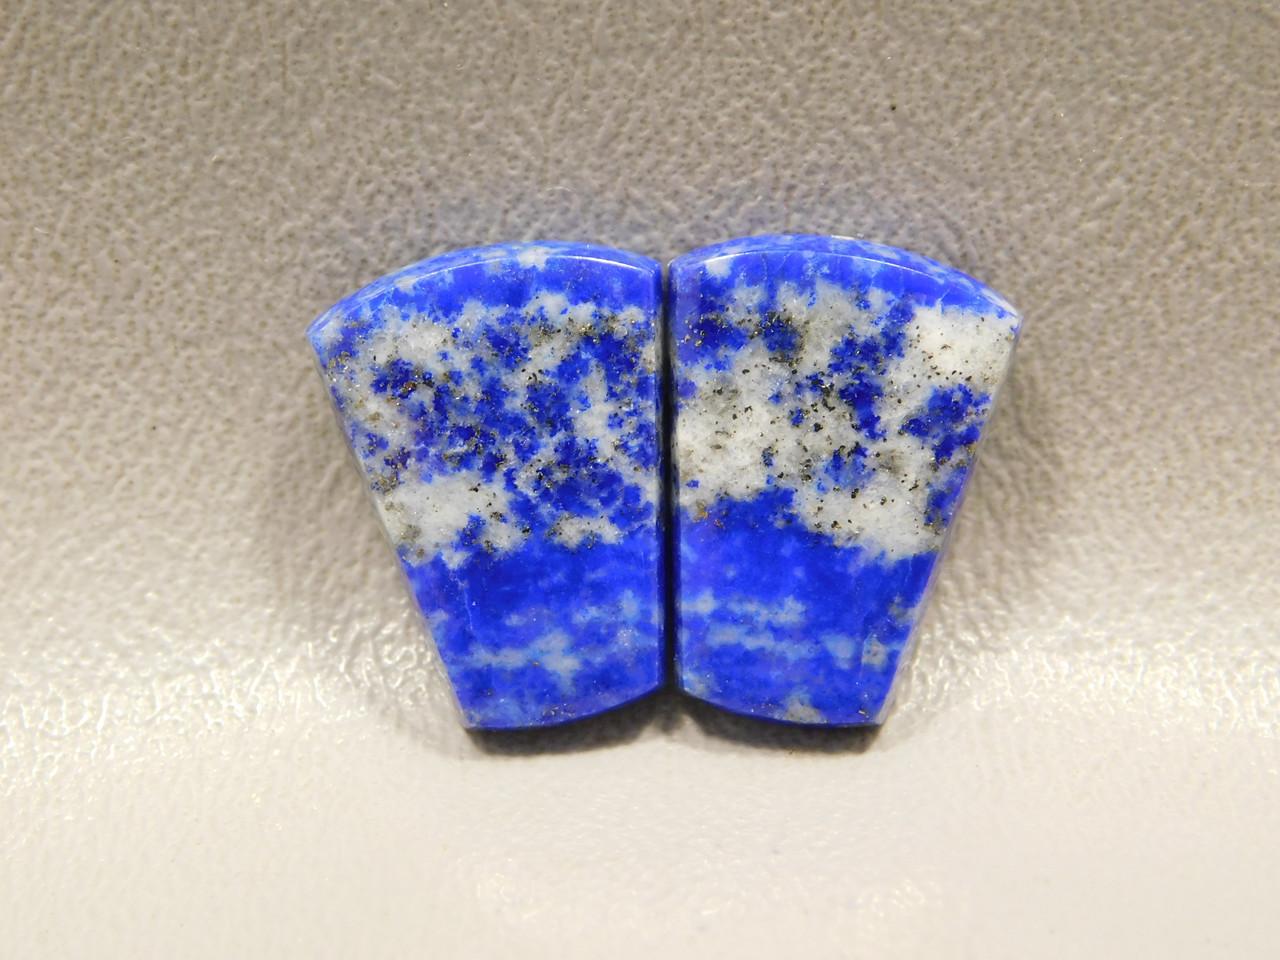 Lapis Lazuli Semi Precious Stone Matched Pair Cabochons #13